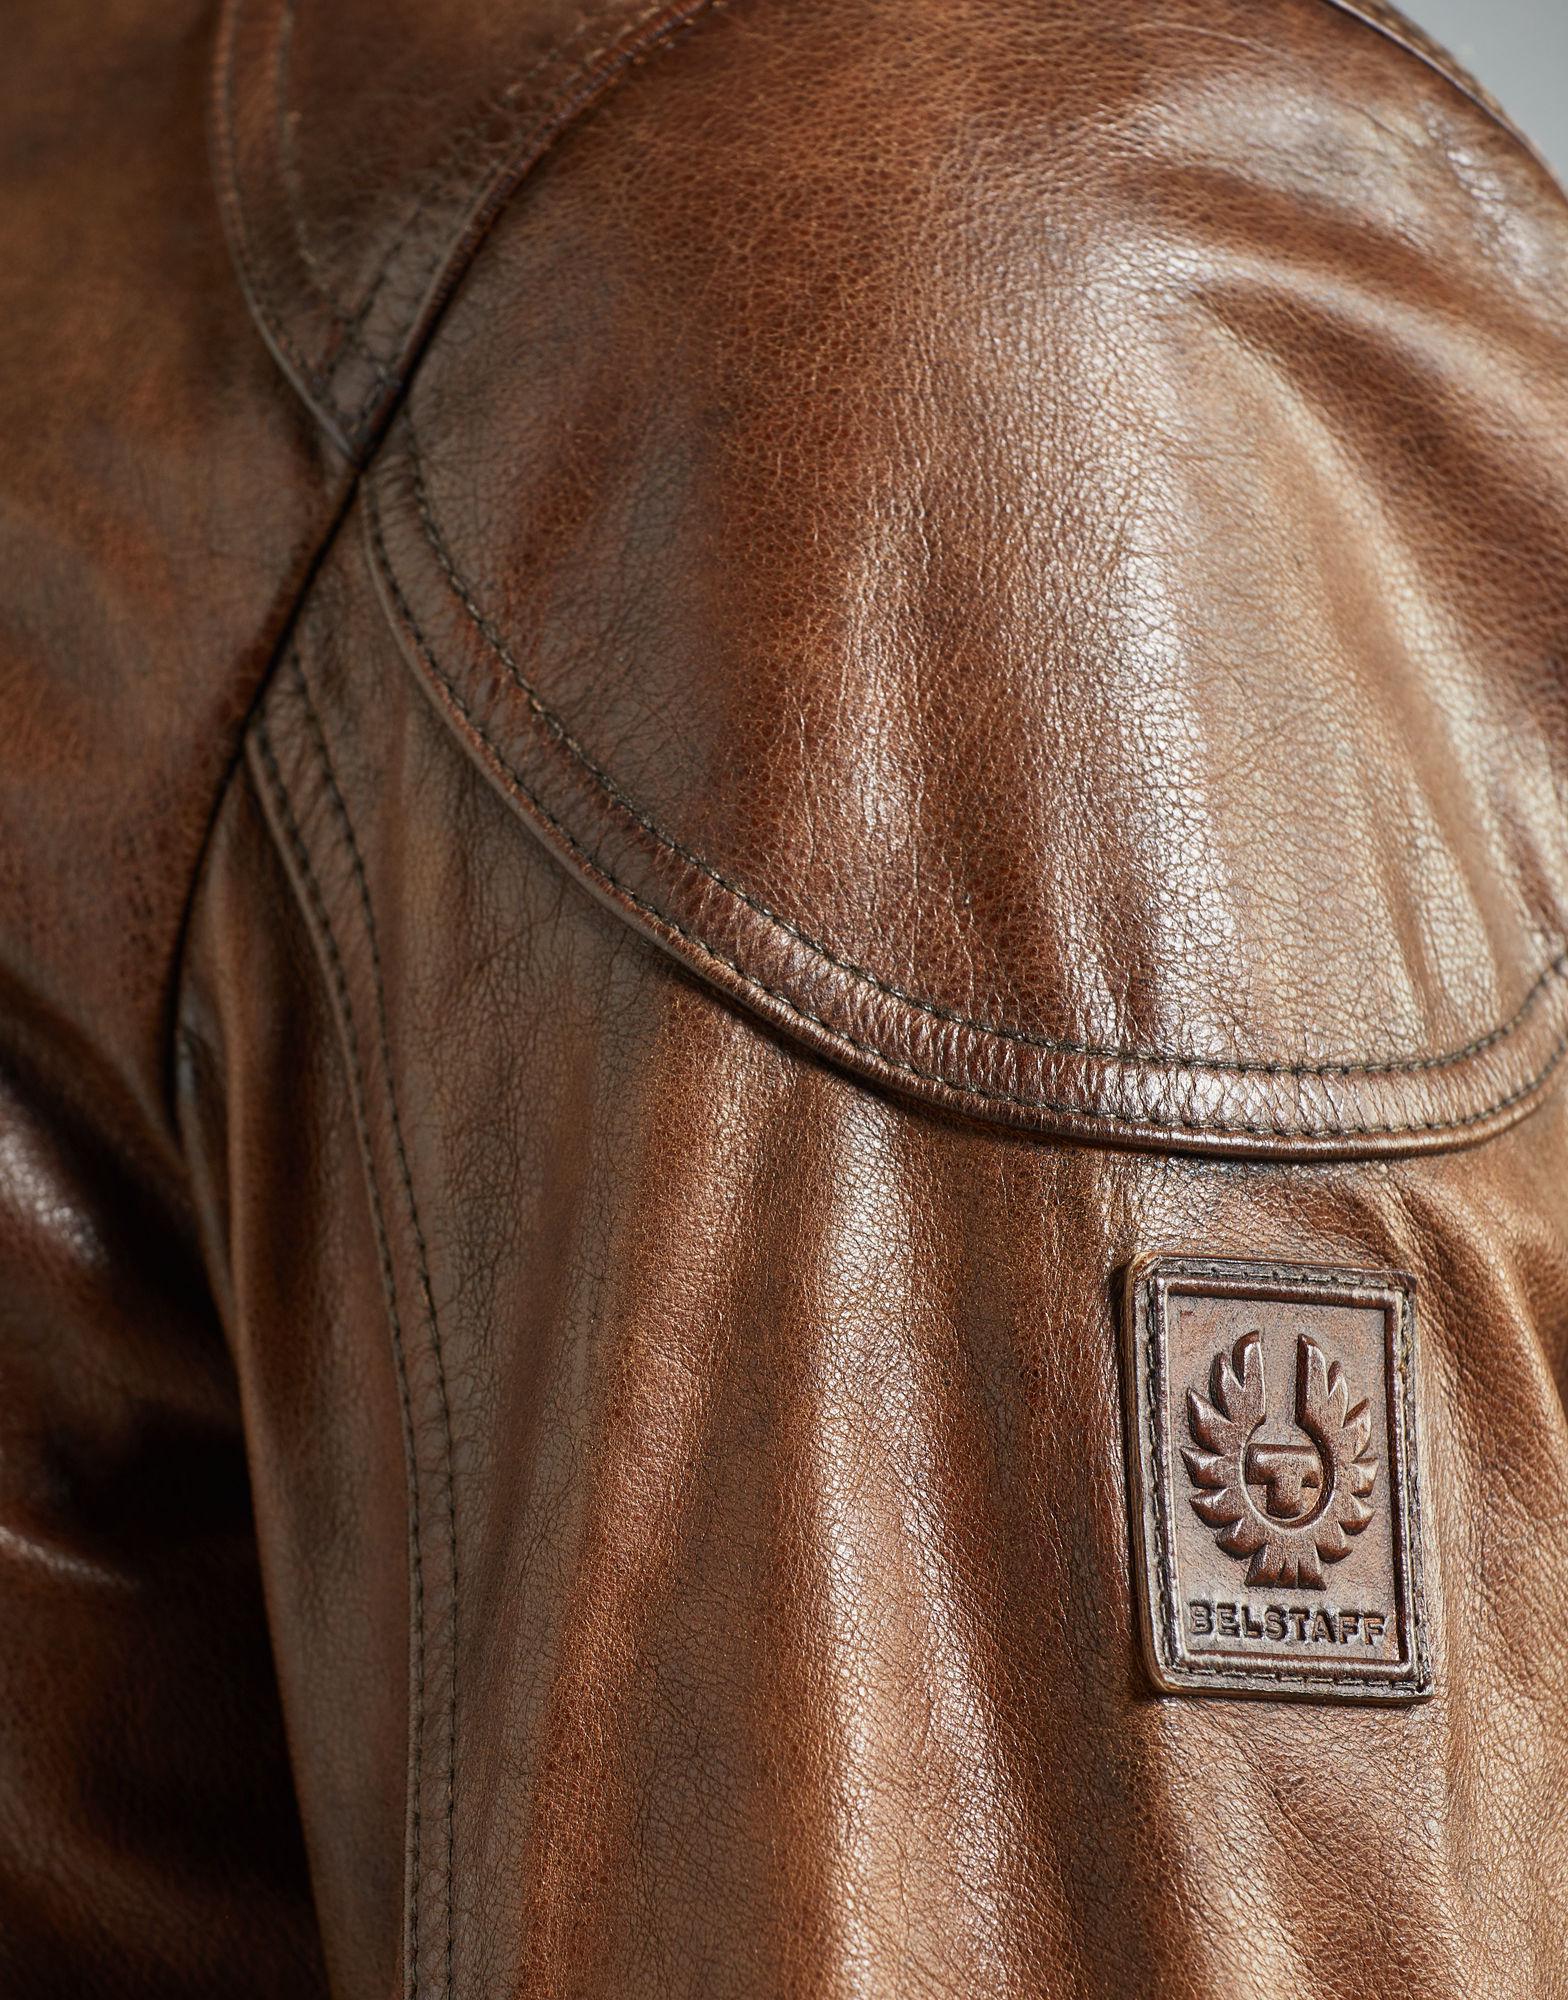 bb7000f5f Belstaff Leather Maxford 2.0 Blouson Jacket in Brown for Men - Lyst